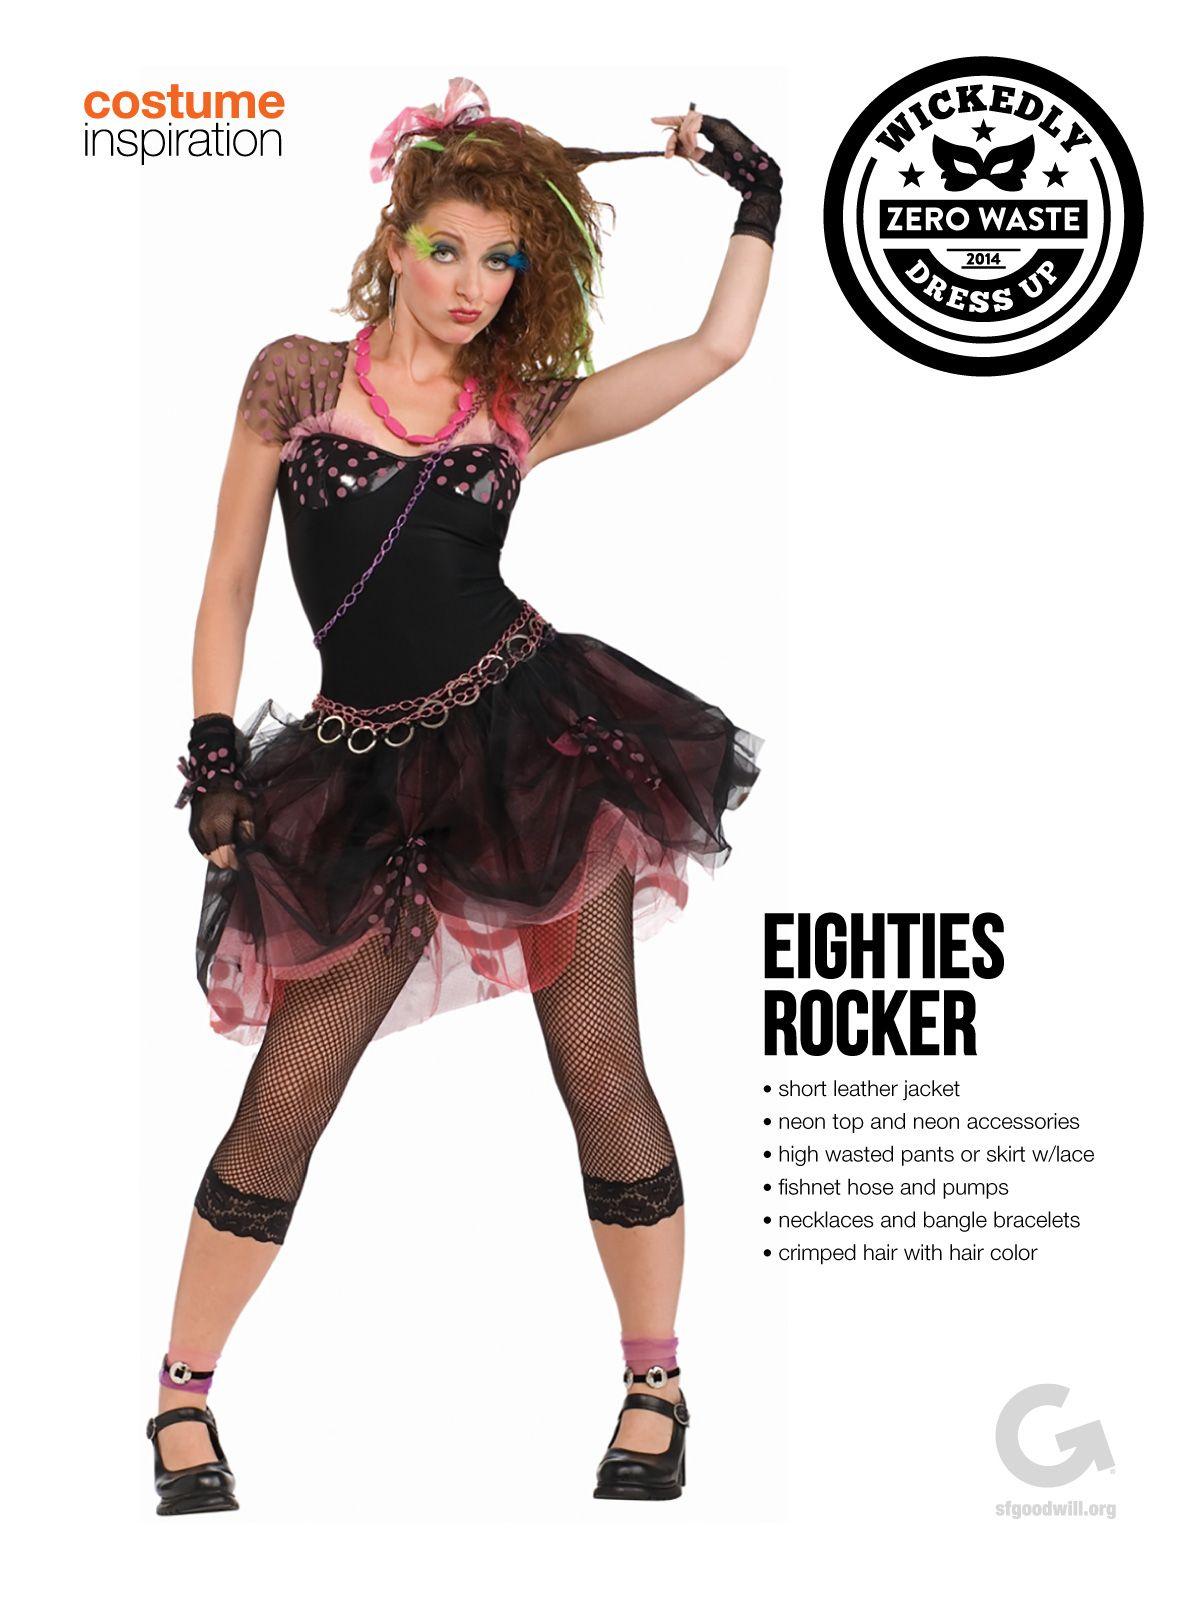 lsf goodwill halloween costume ideas and inspiration eighties rocker gal - 80s Rocker Halloween Costume